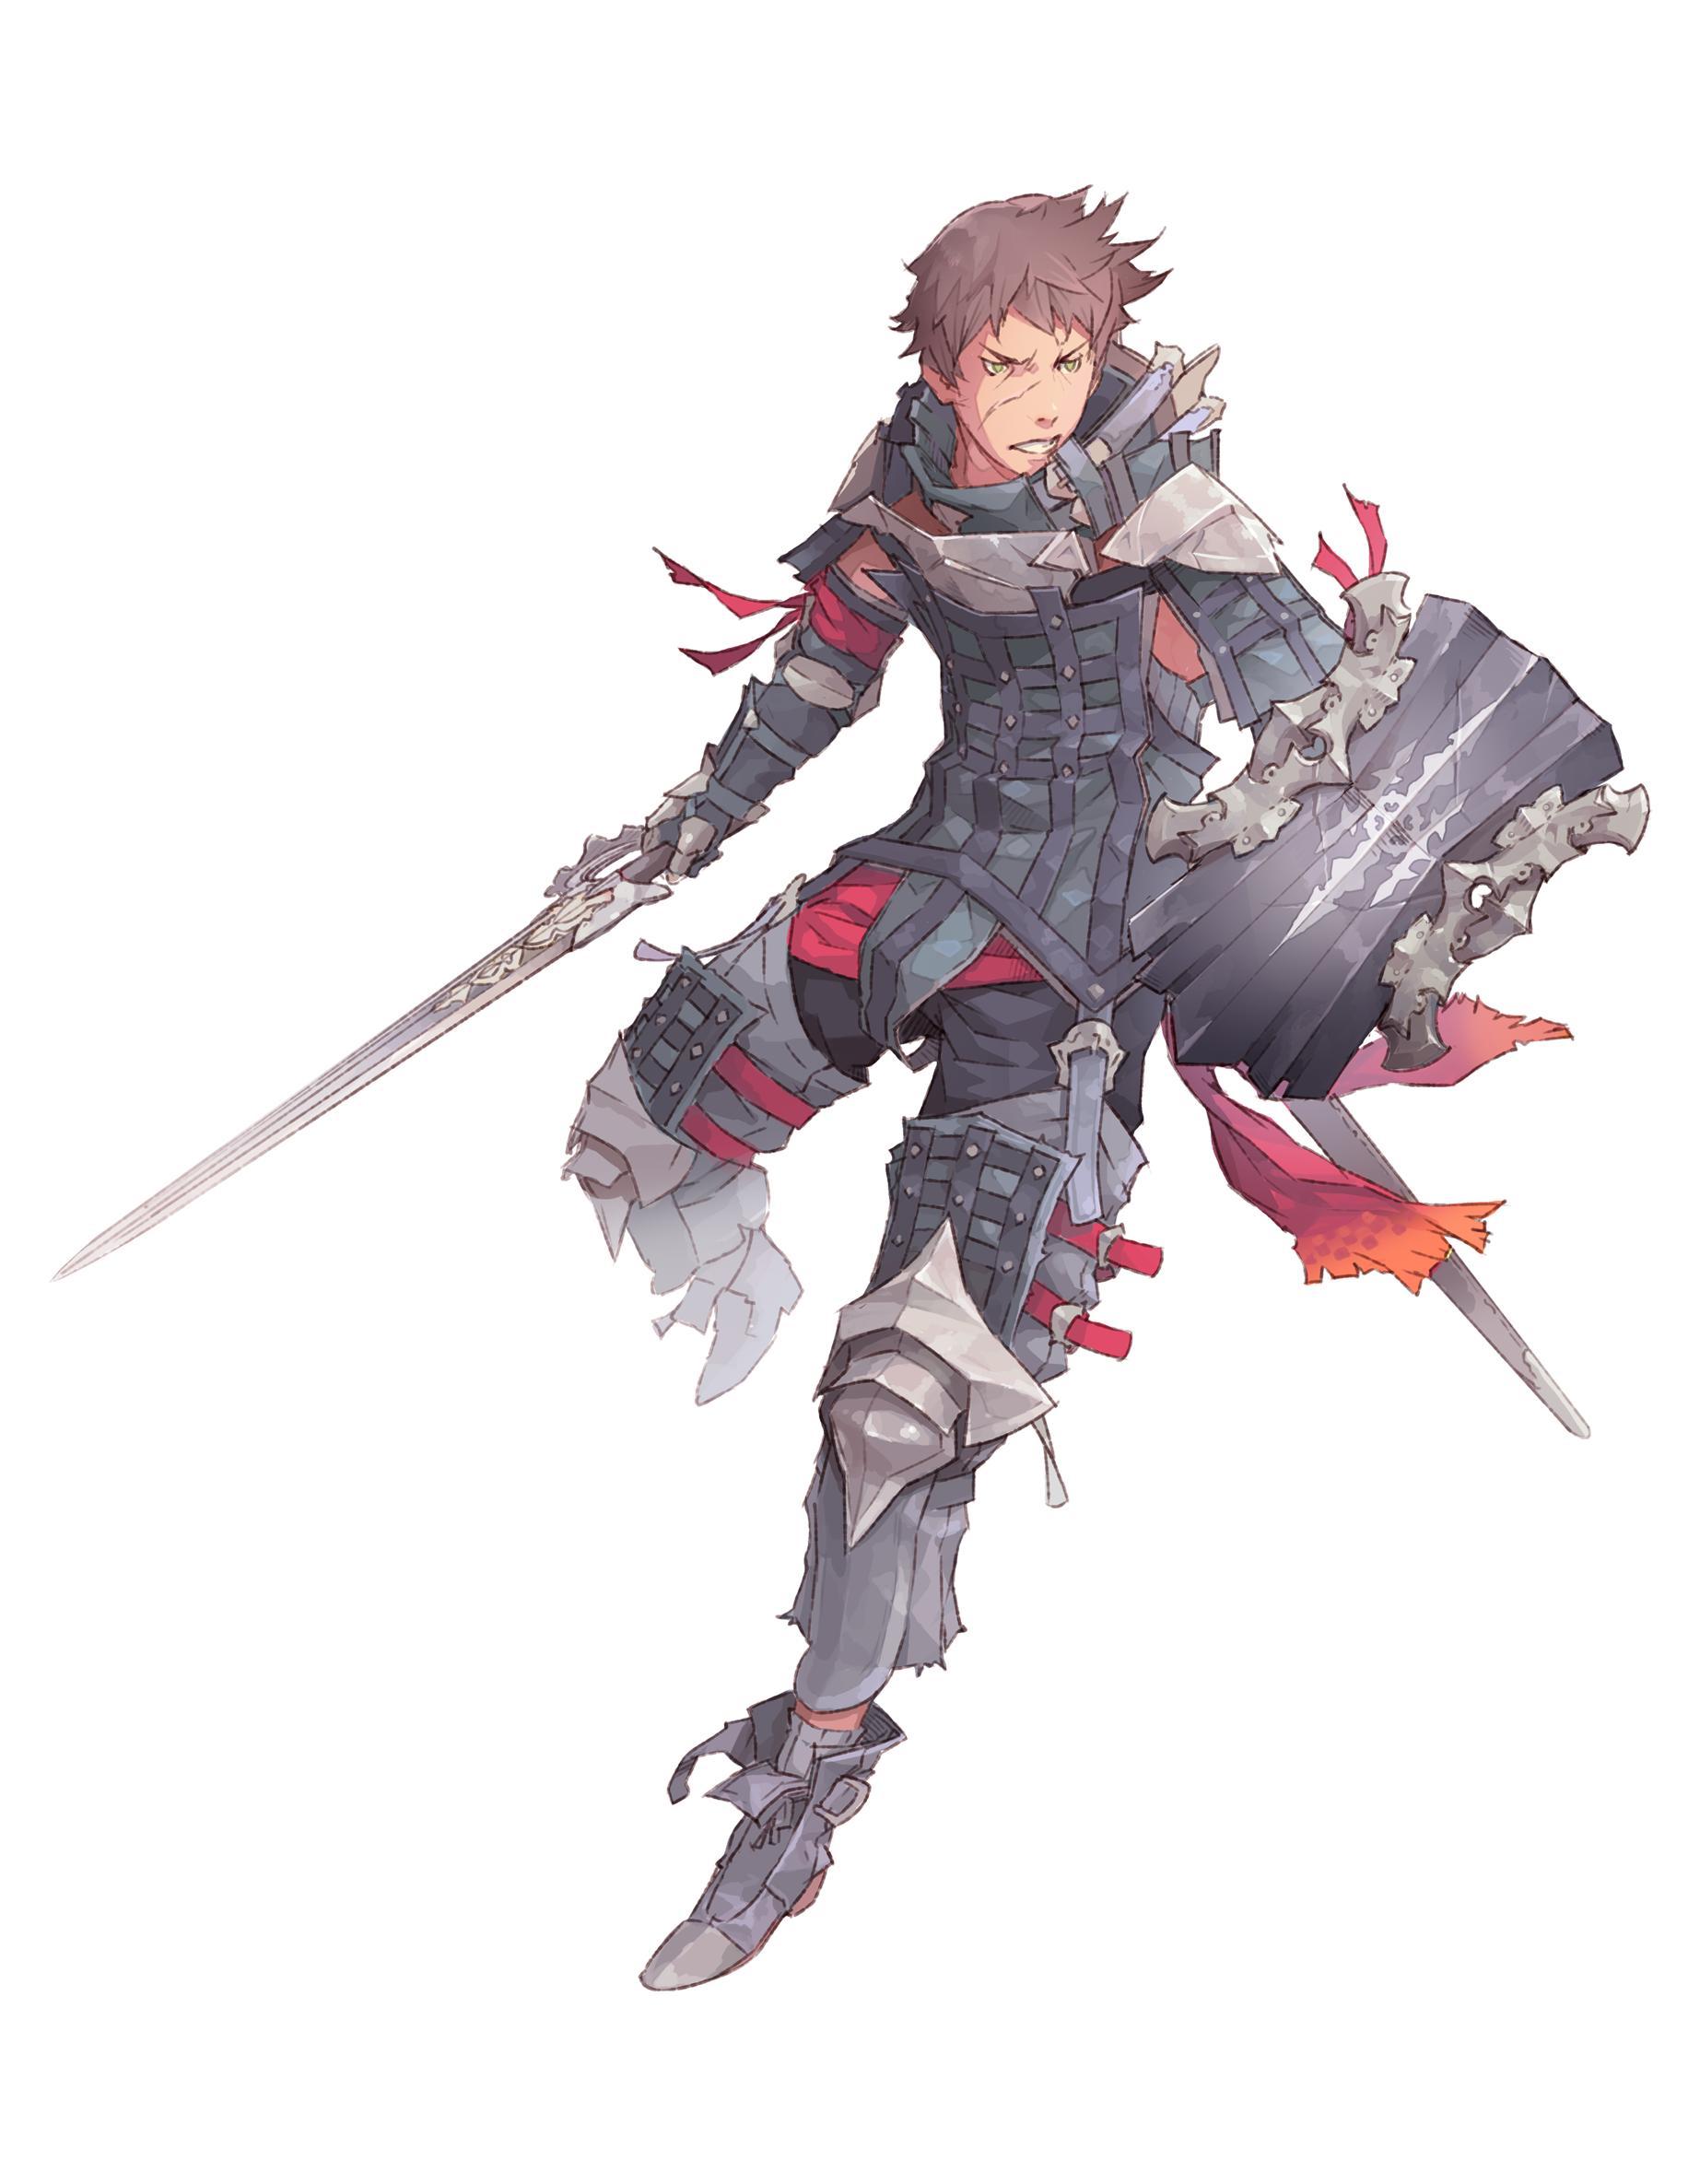 Swordsman by ChristopherOnciu